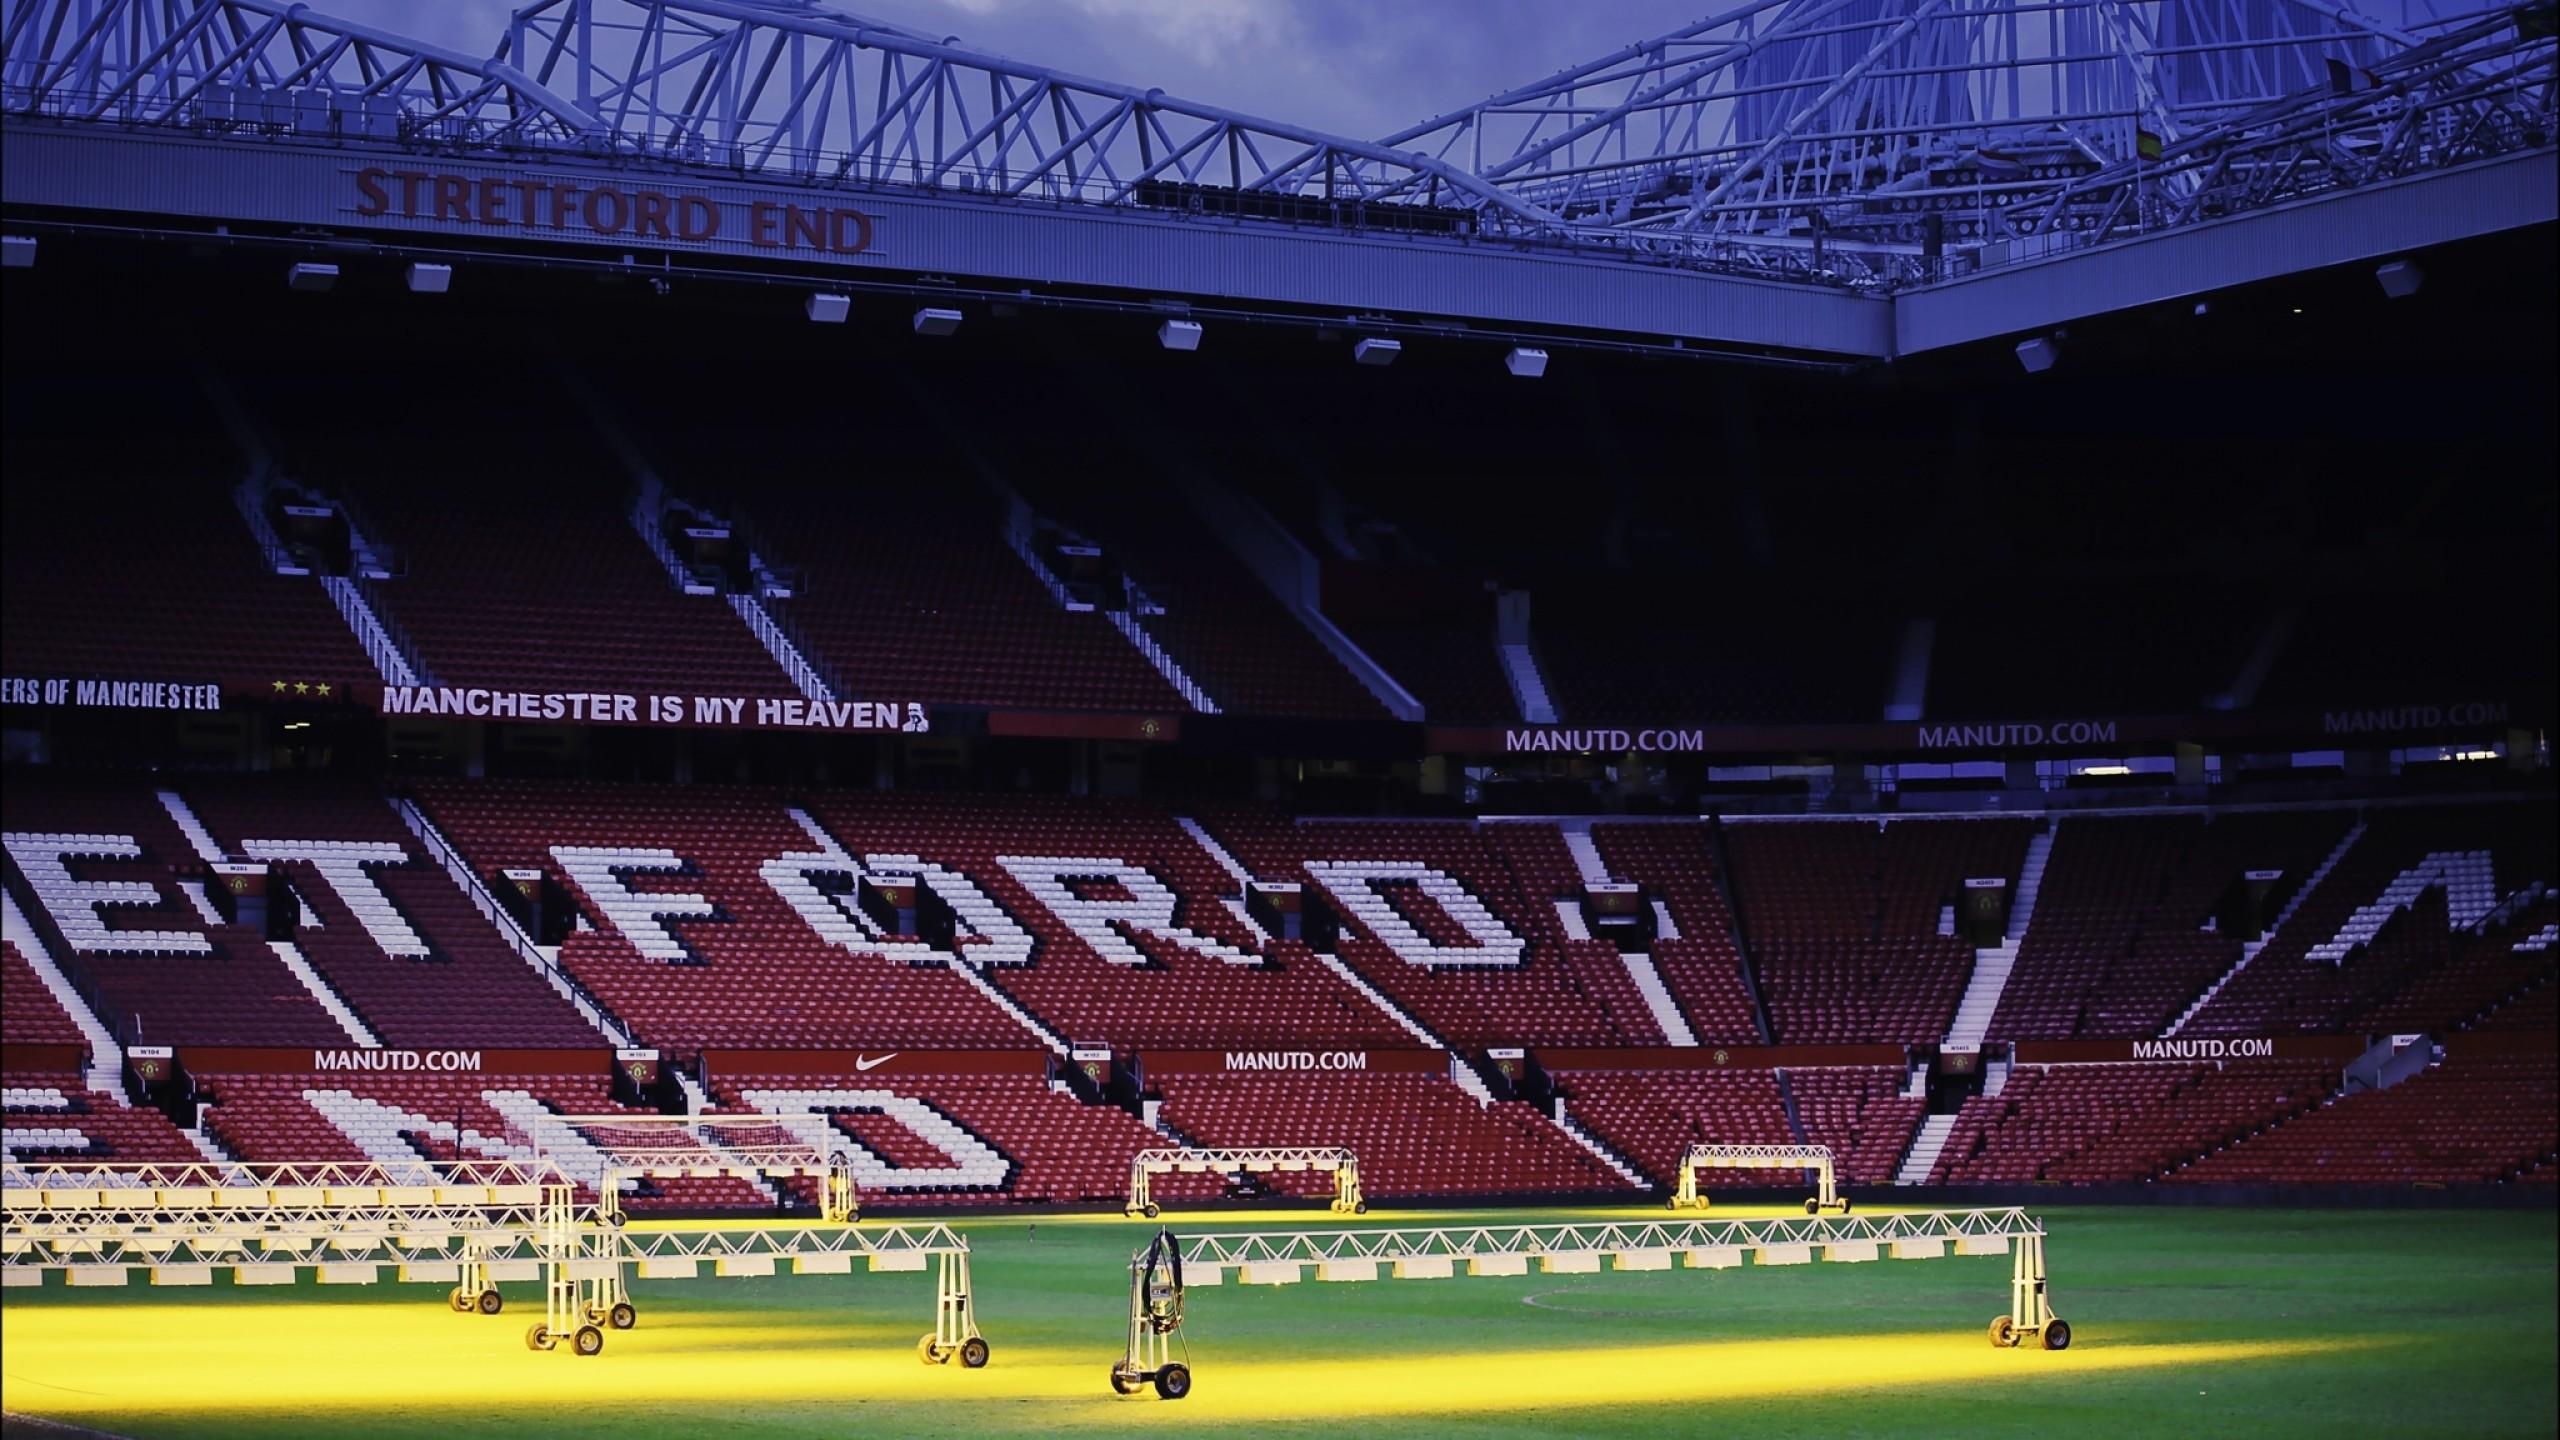 Manchester United Old Trafford Stadium Wallpapers Hd Old Trafford Wallpaper 64 Images